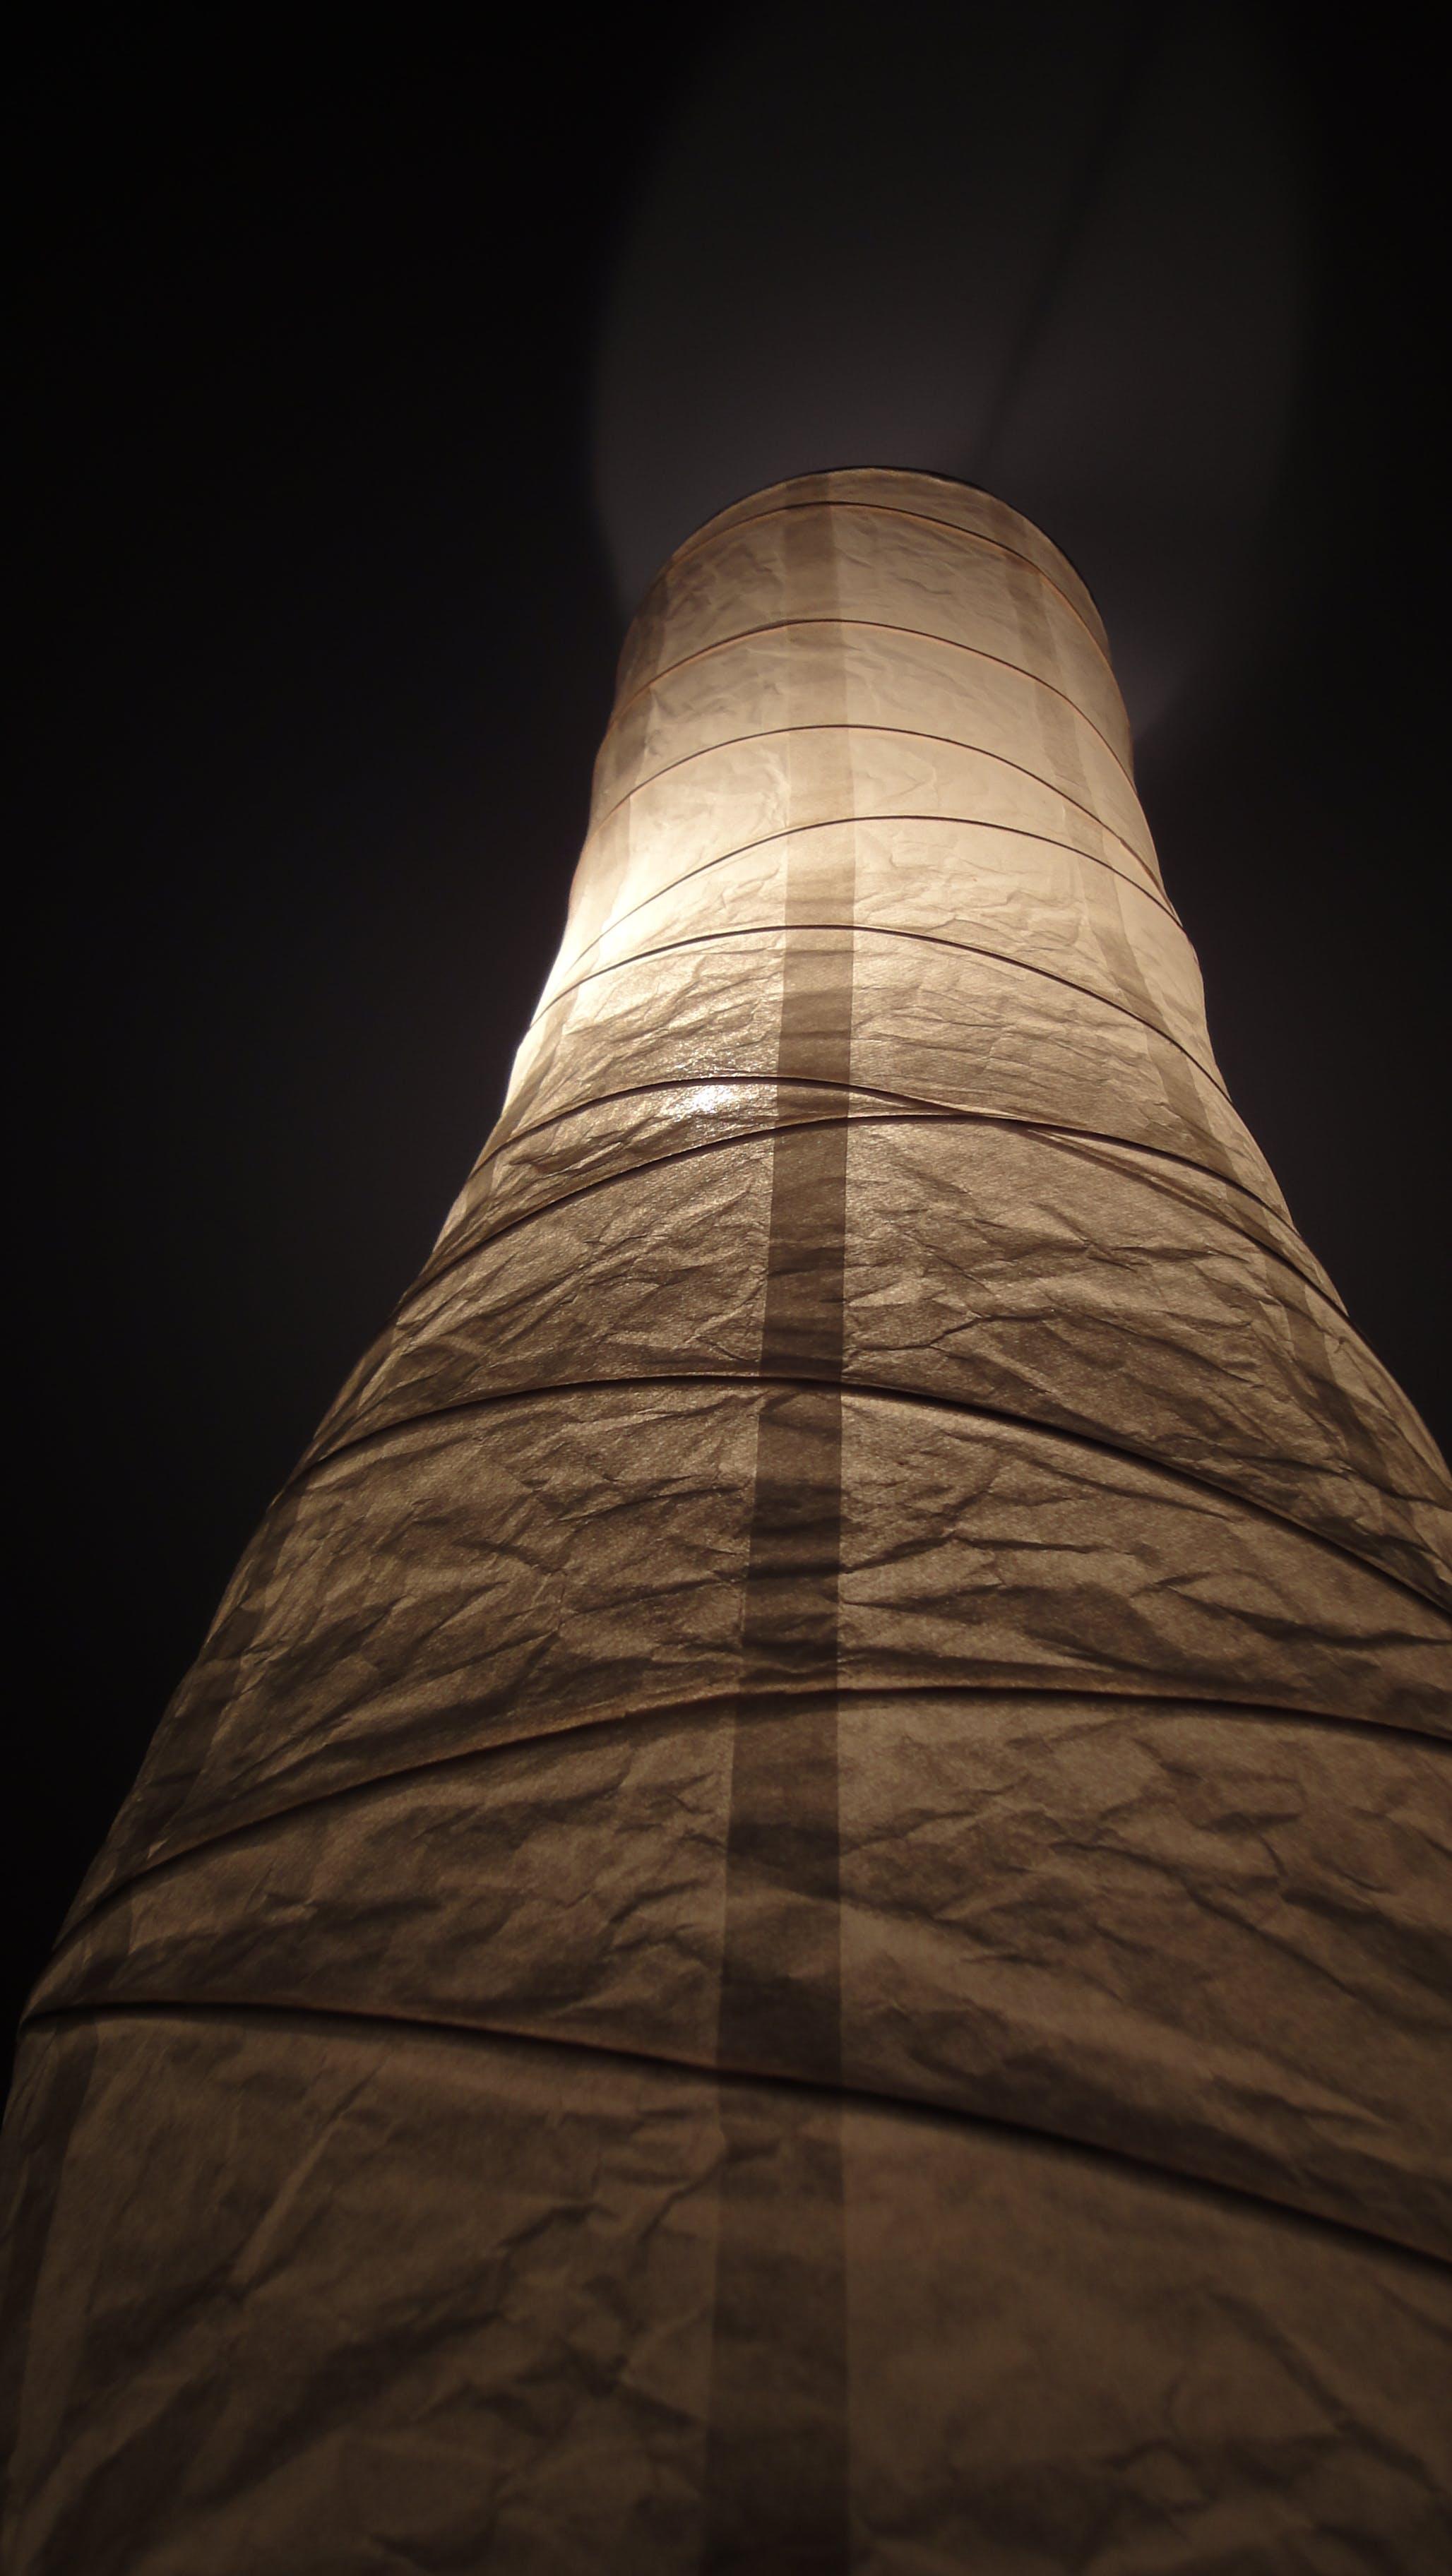 Free stock photo of light, lamp, shadow